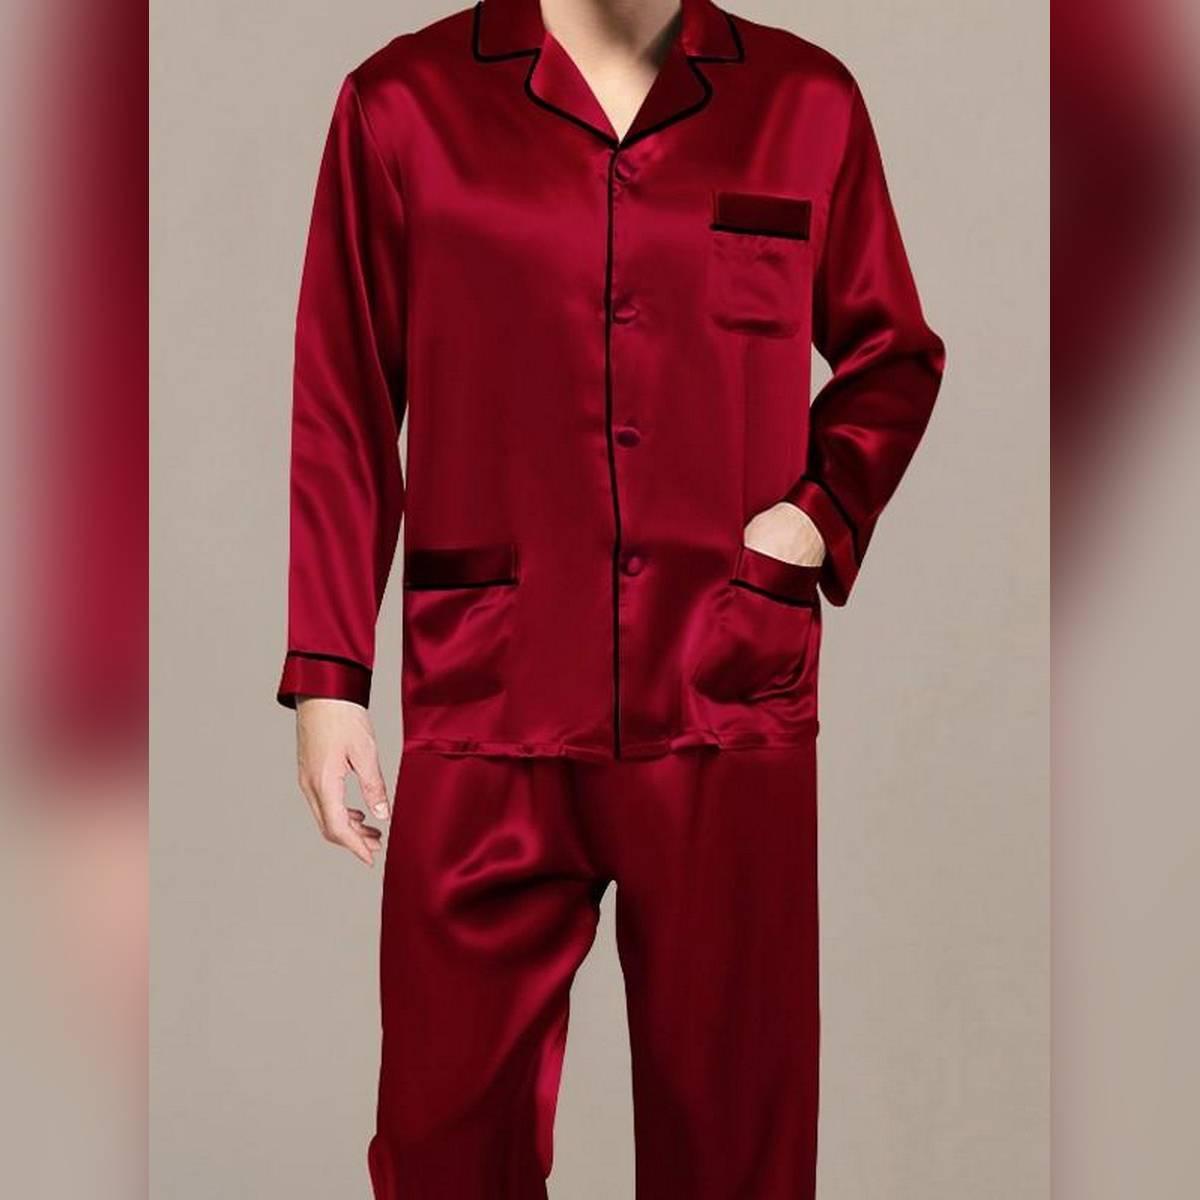 Sebastian Men's silky comfy satin  pajama set Supreme Mens Collection Vol 1 Soft against skin Pajama Set sleepwear